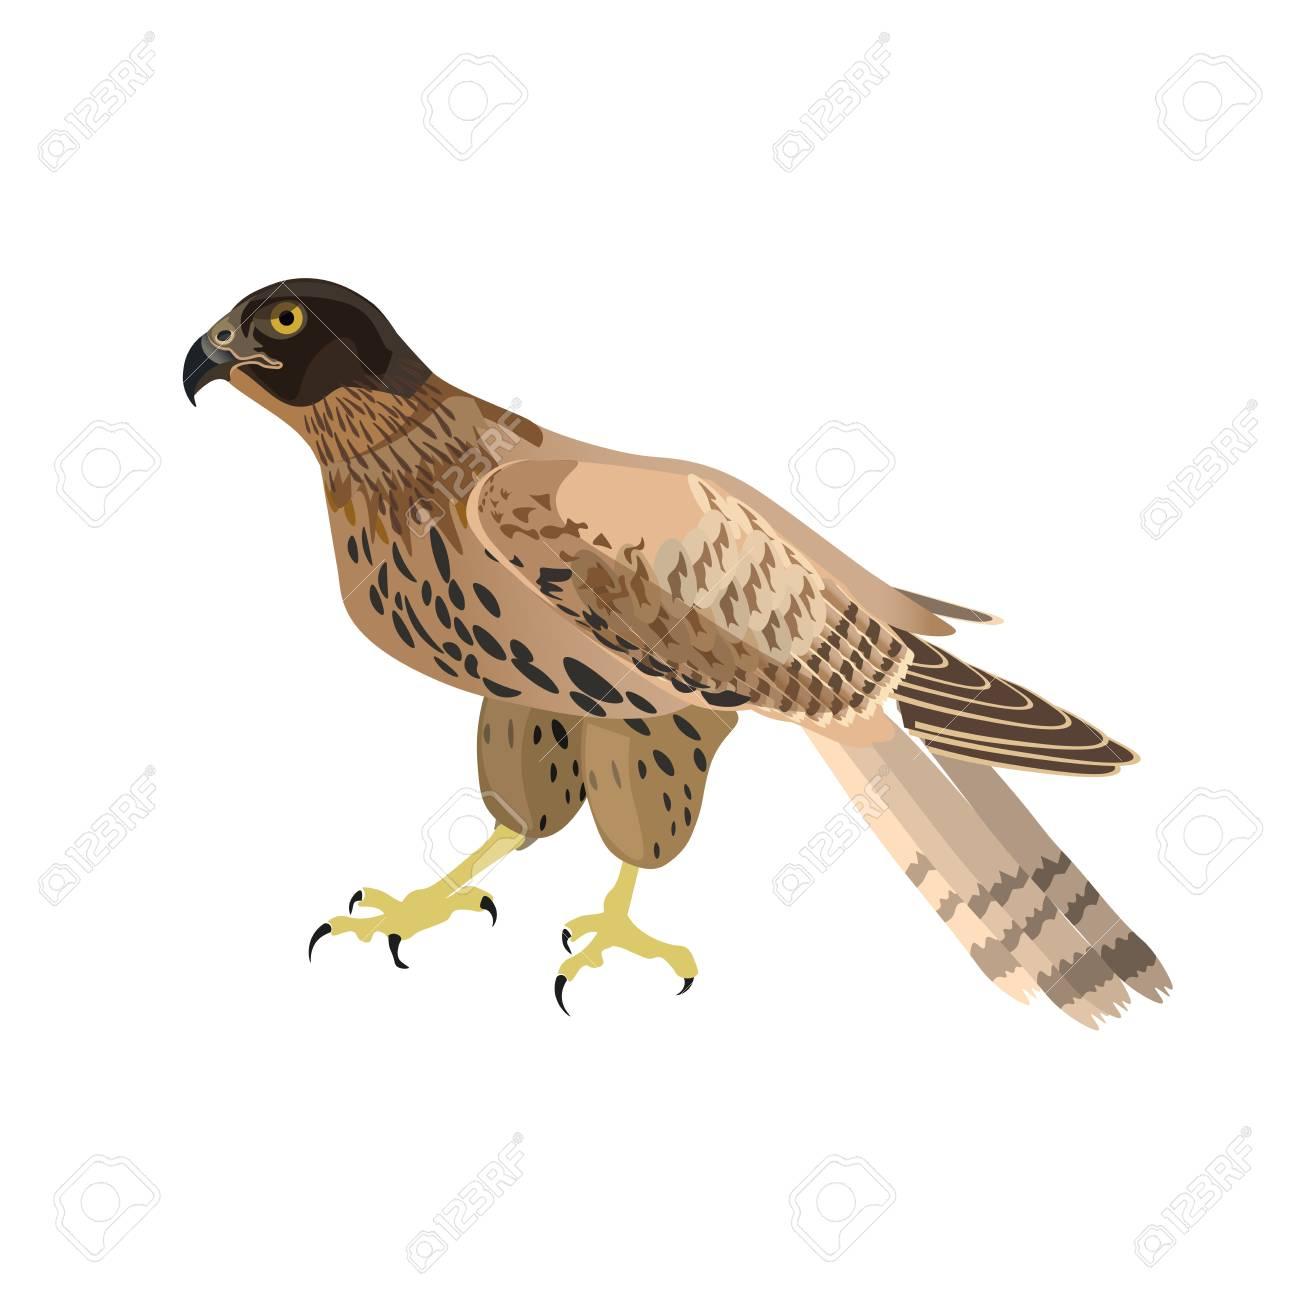 Falcon clipart harrier. Free download clip art